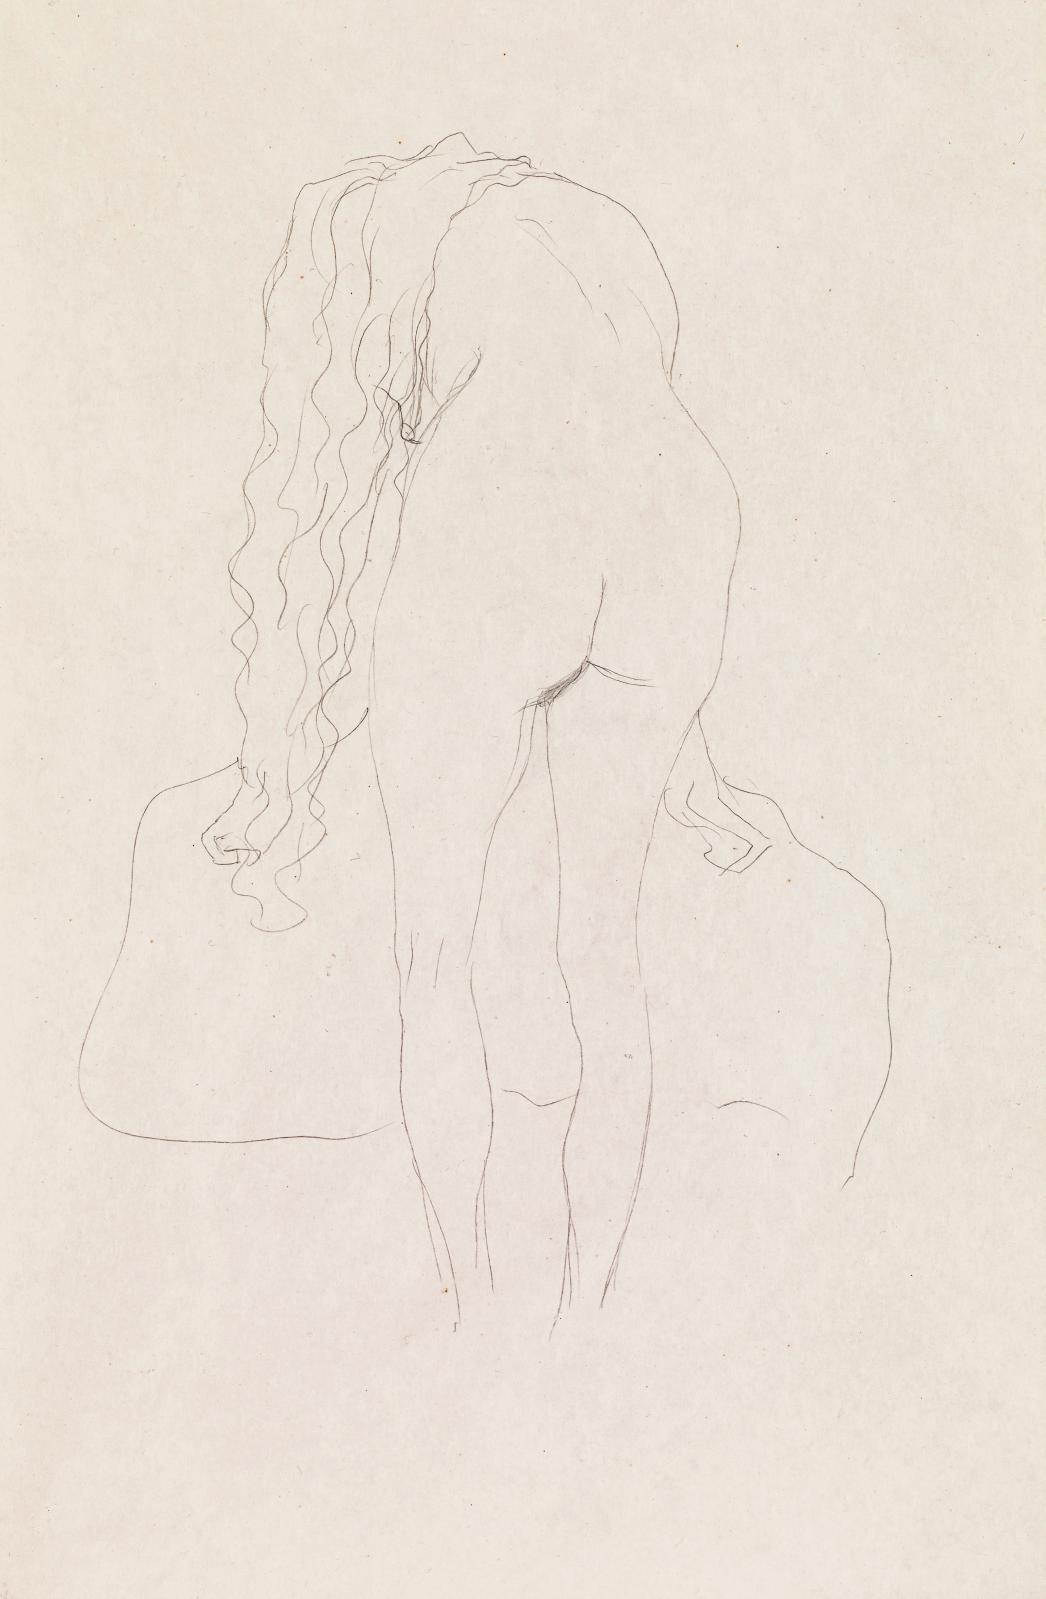 Gustav Klimt (1862-1918), Nu penché en avant, de dos, dessin au crayon, 1907-1908, 56,5x37cm. Estimation: 35000/70000€